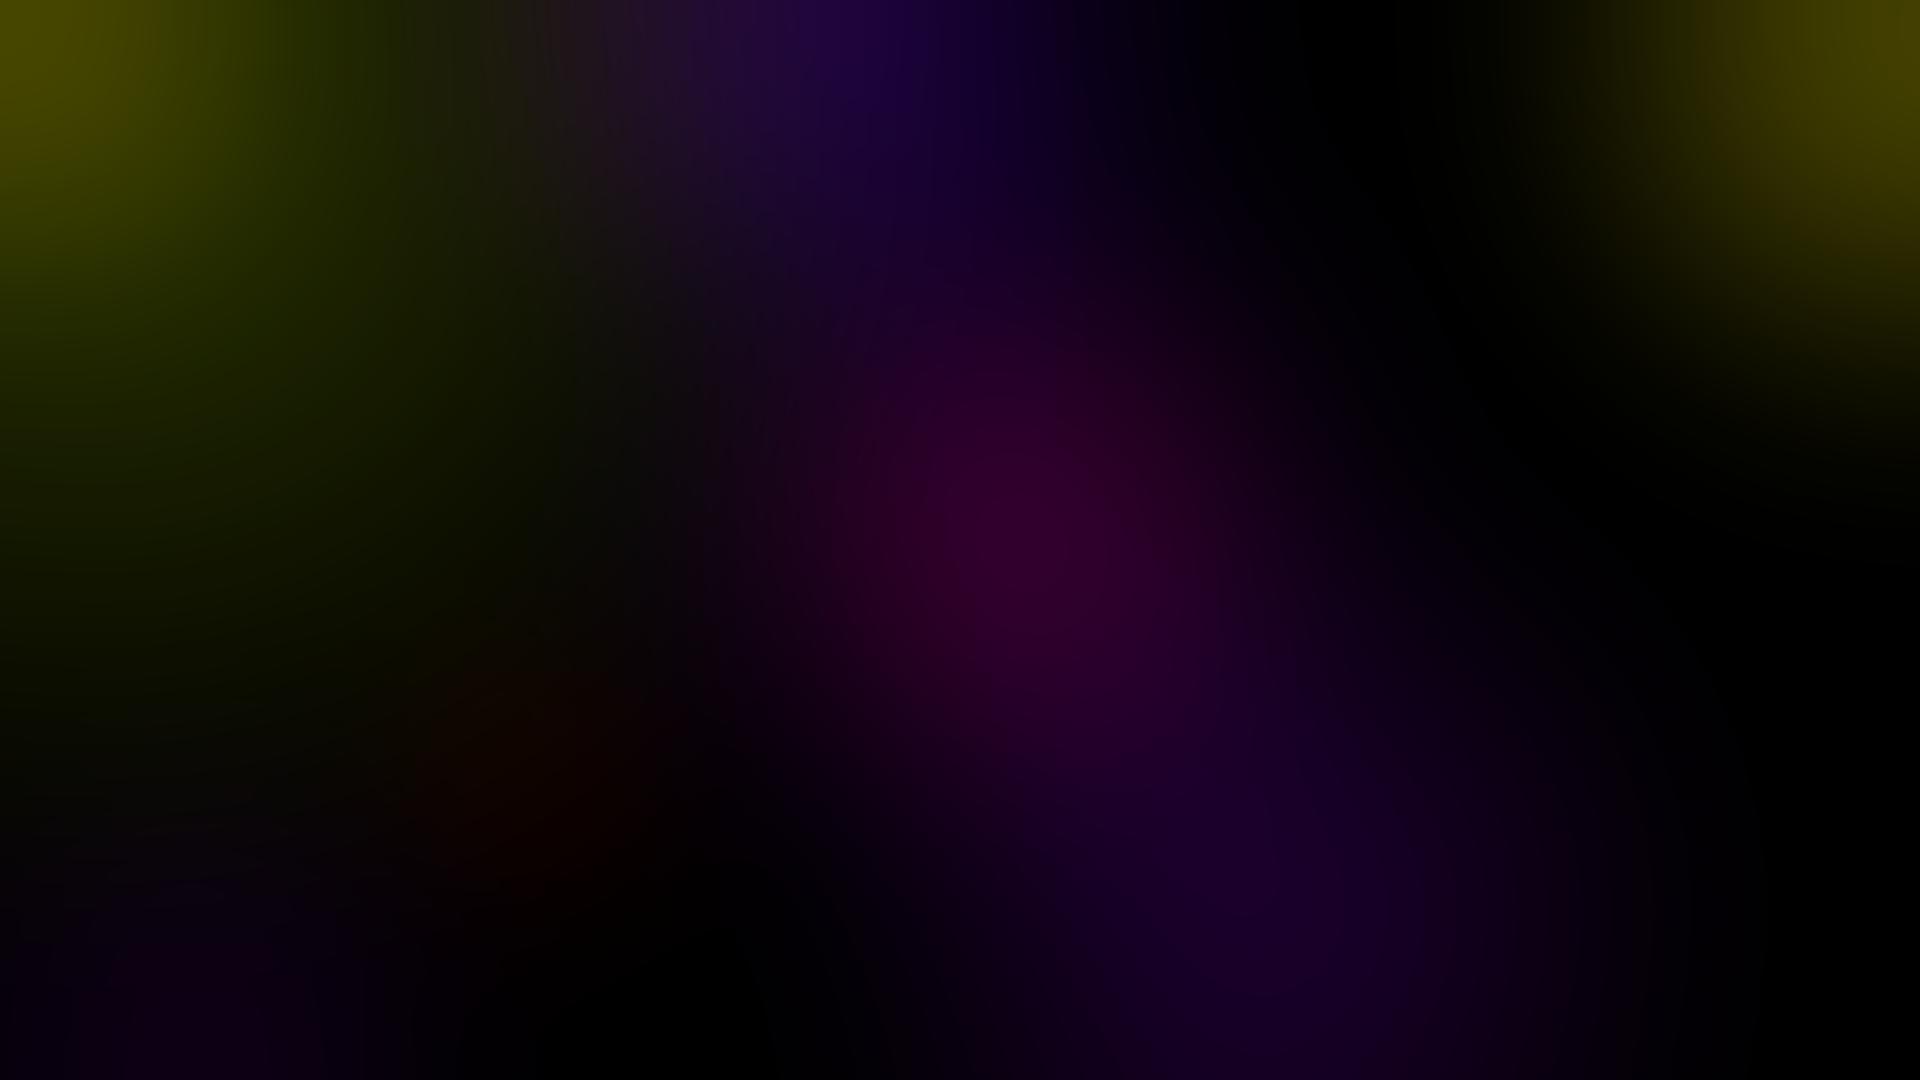 Black Twitter Backgrounds 1920x1080